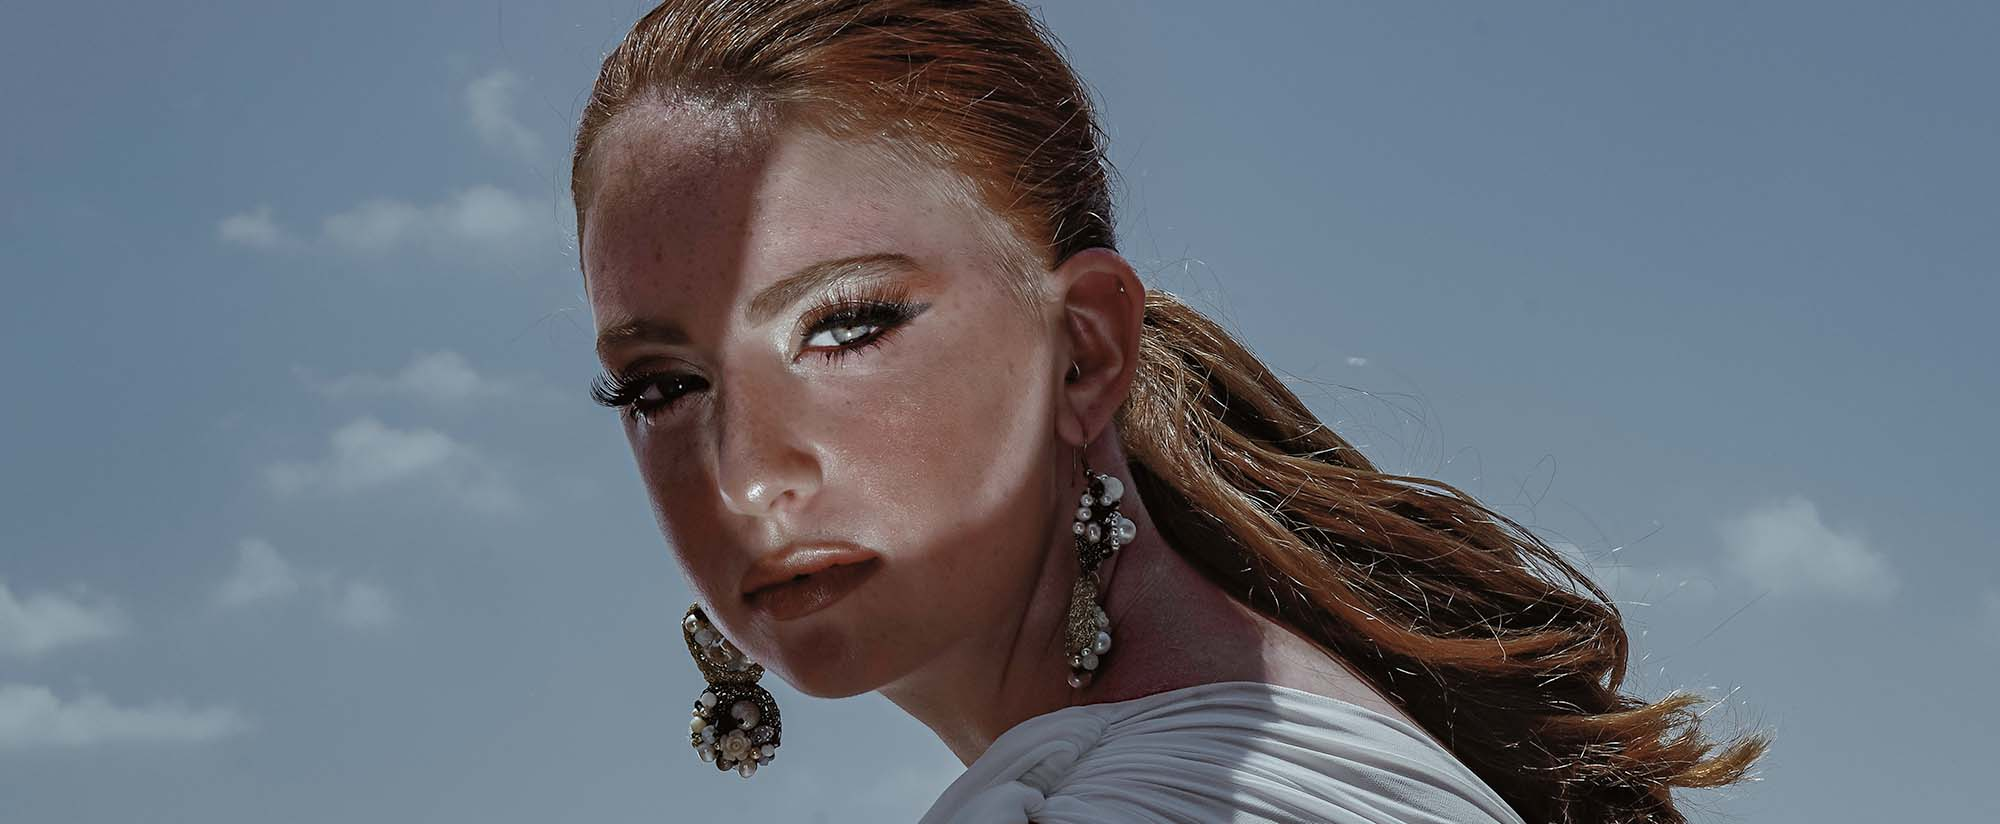 Fashion Israel, אופנה, איפור, אורנה רימוק, צילום, בן לאון, דוגמנית, אמילי זלצר, מגזין אופנה -15